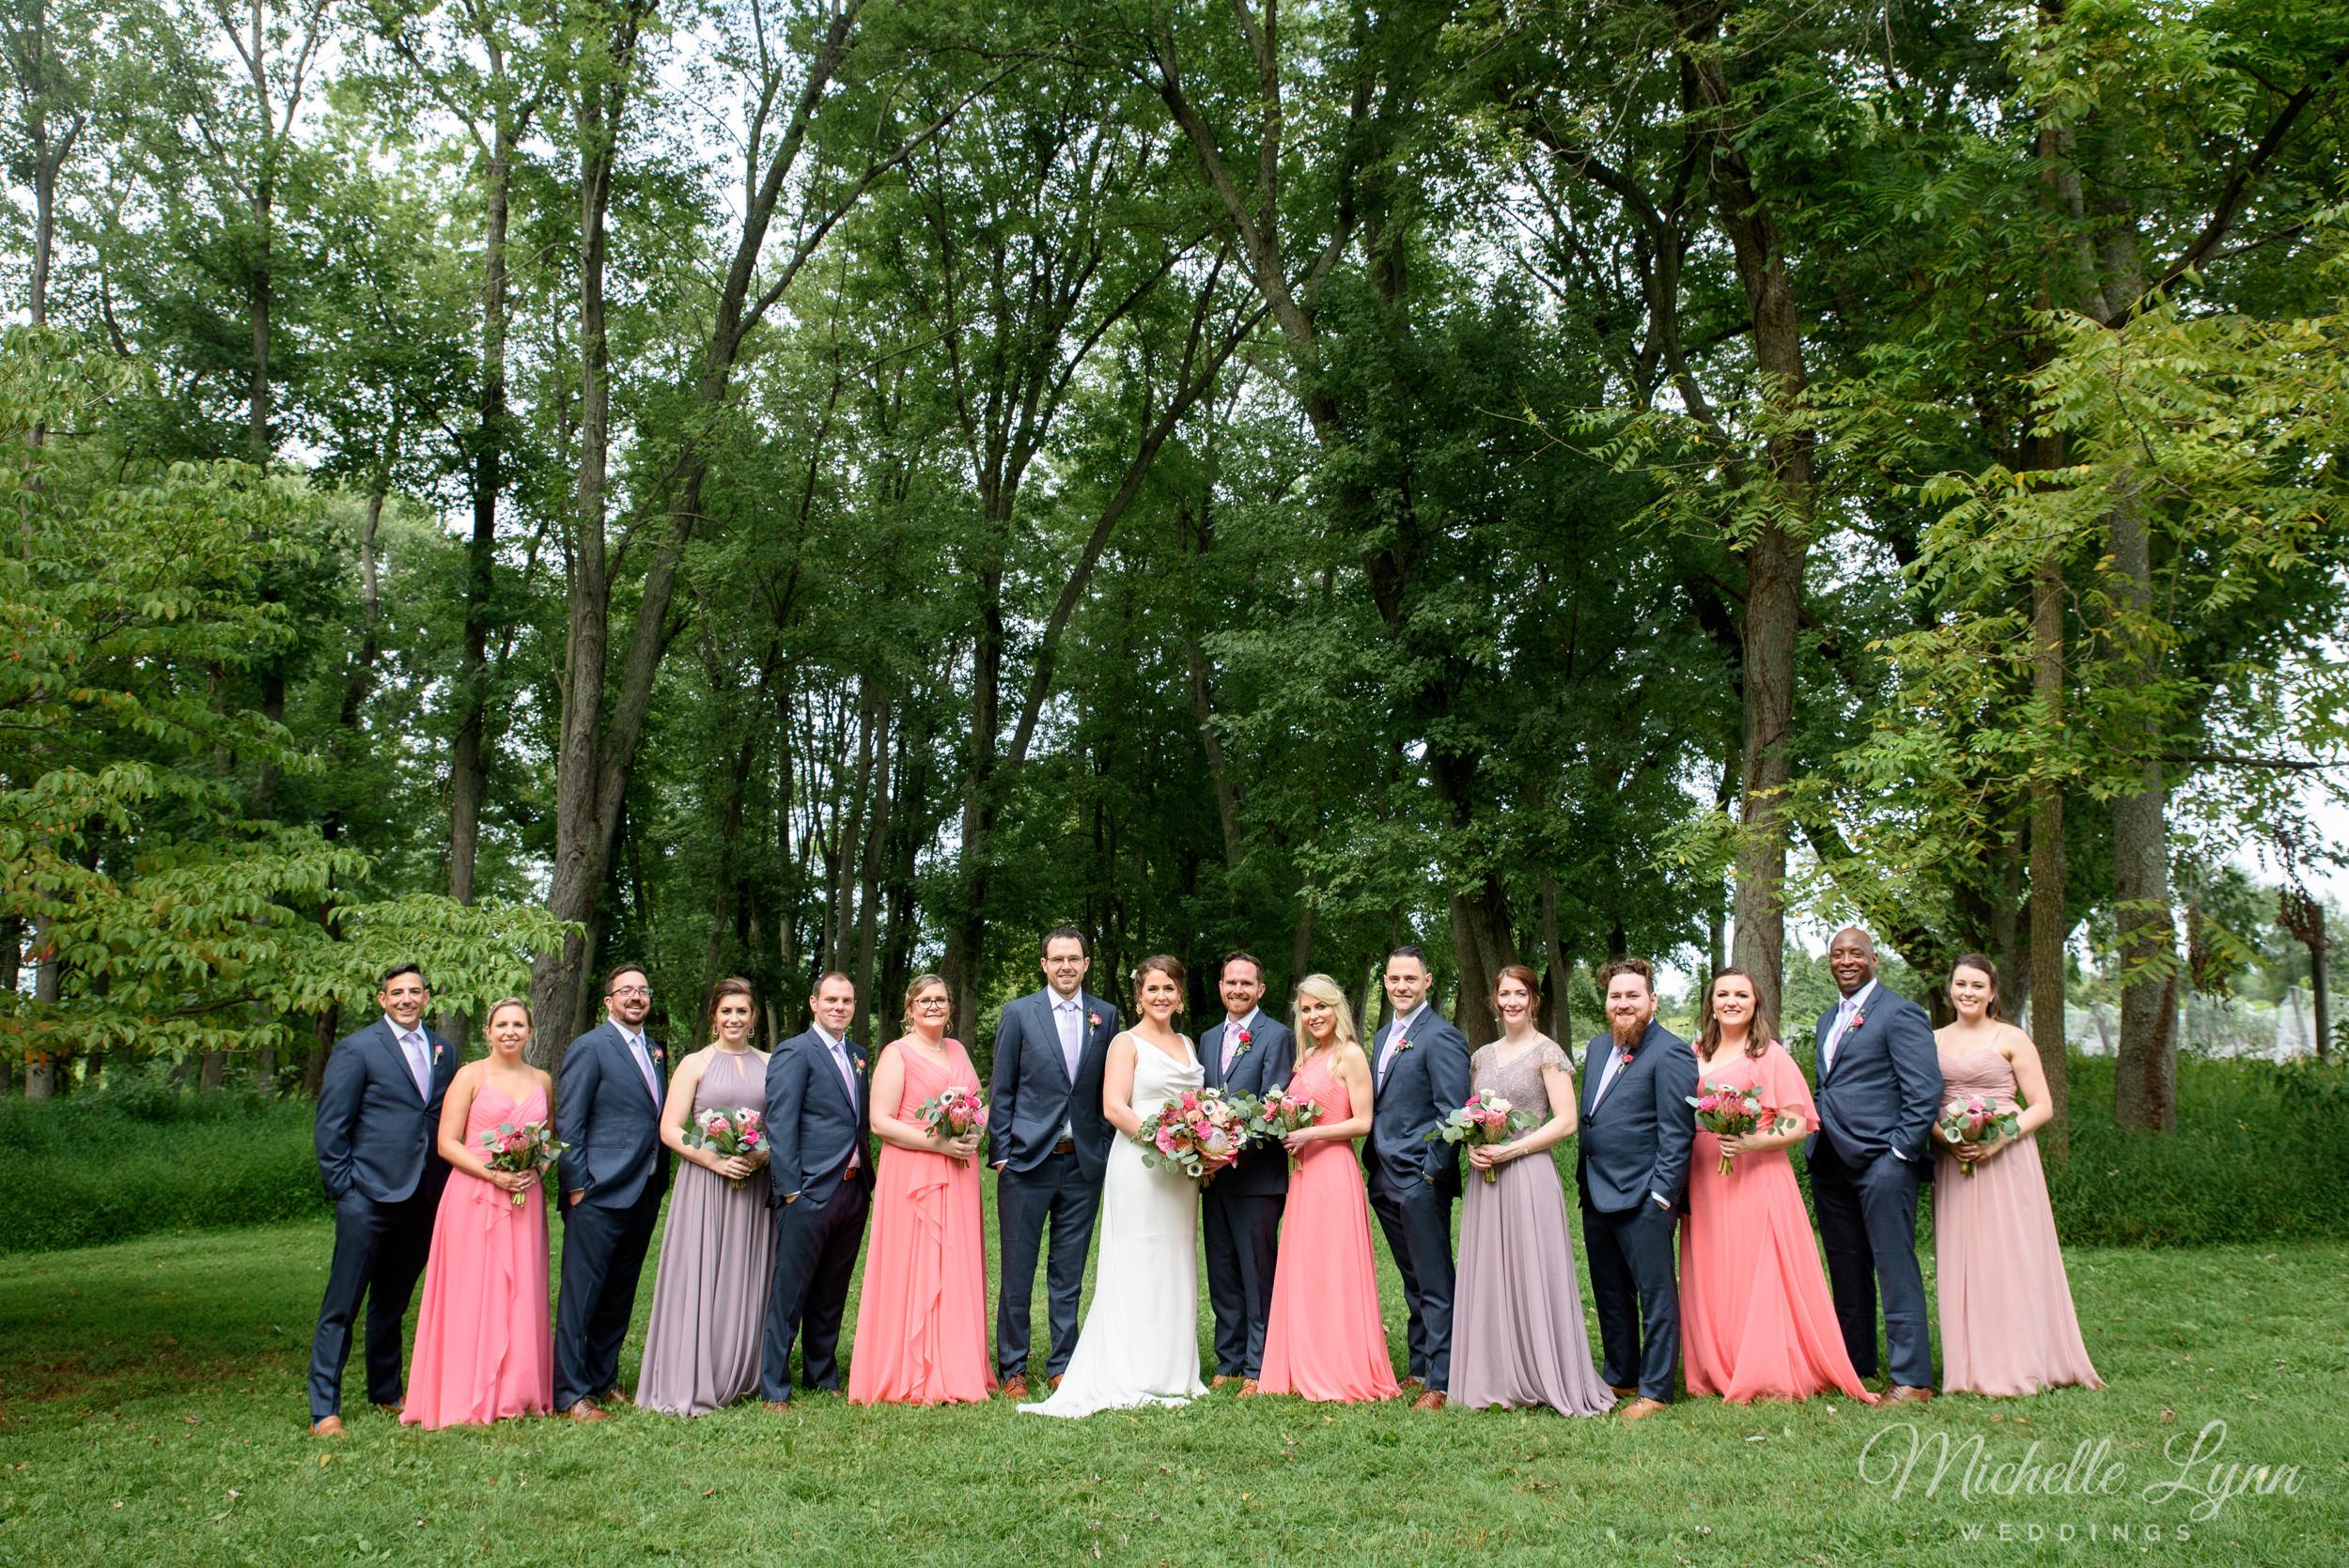 mlw-unionville-vineyards-nj-wedding-photography-53.jpg